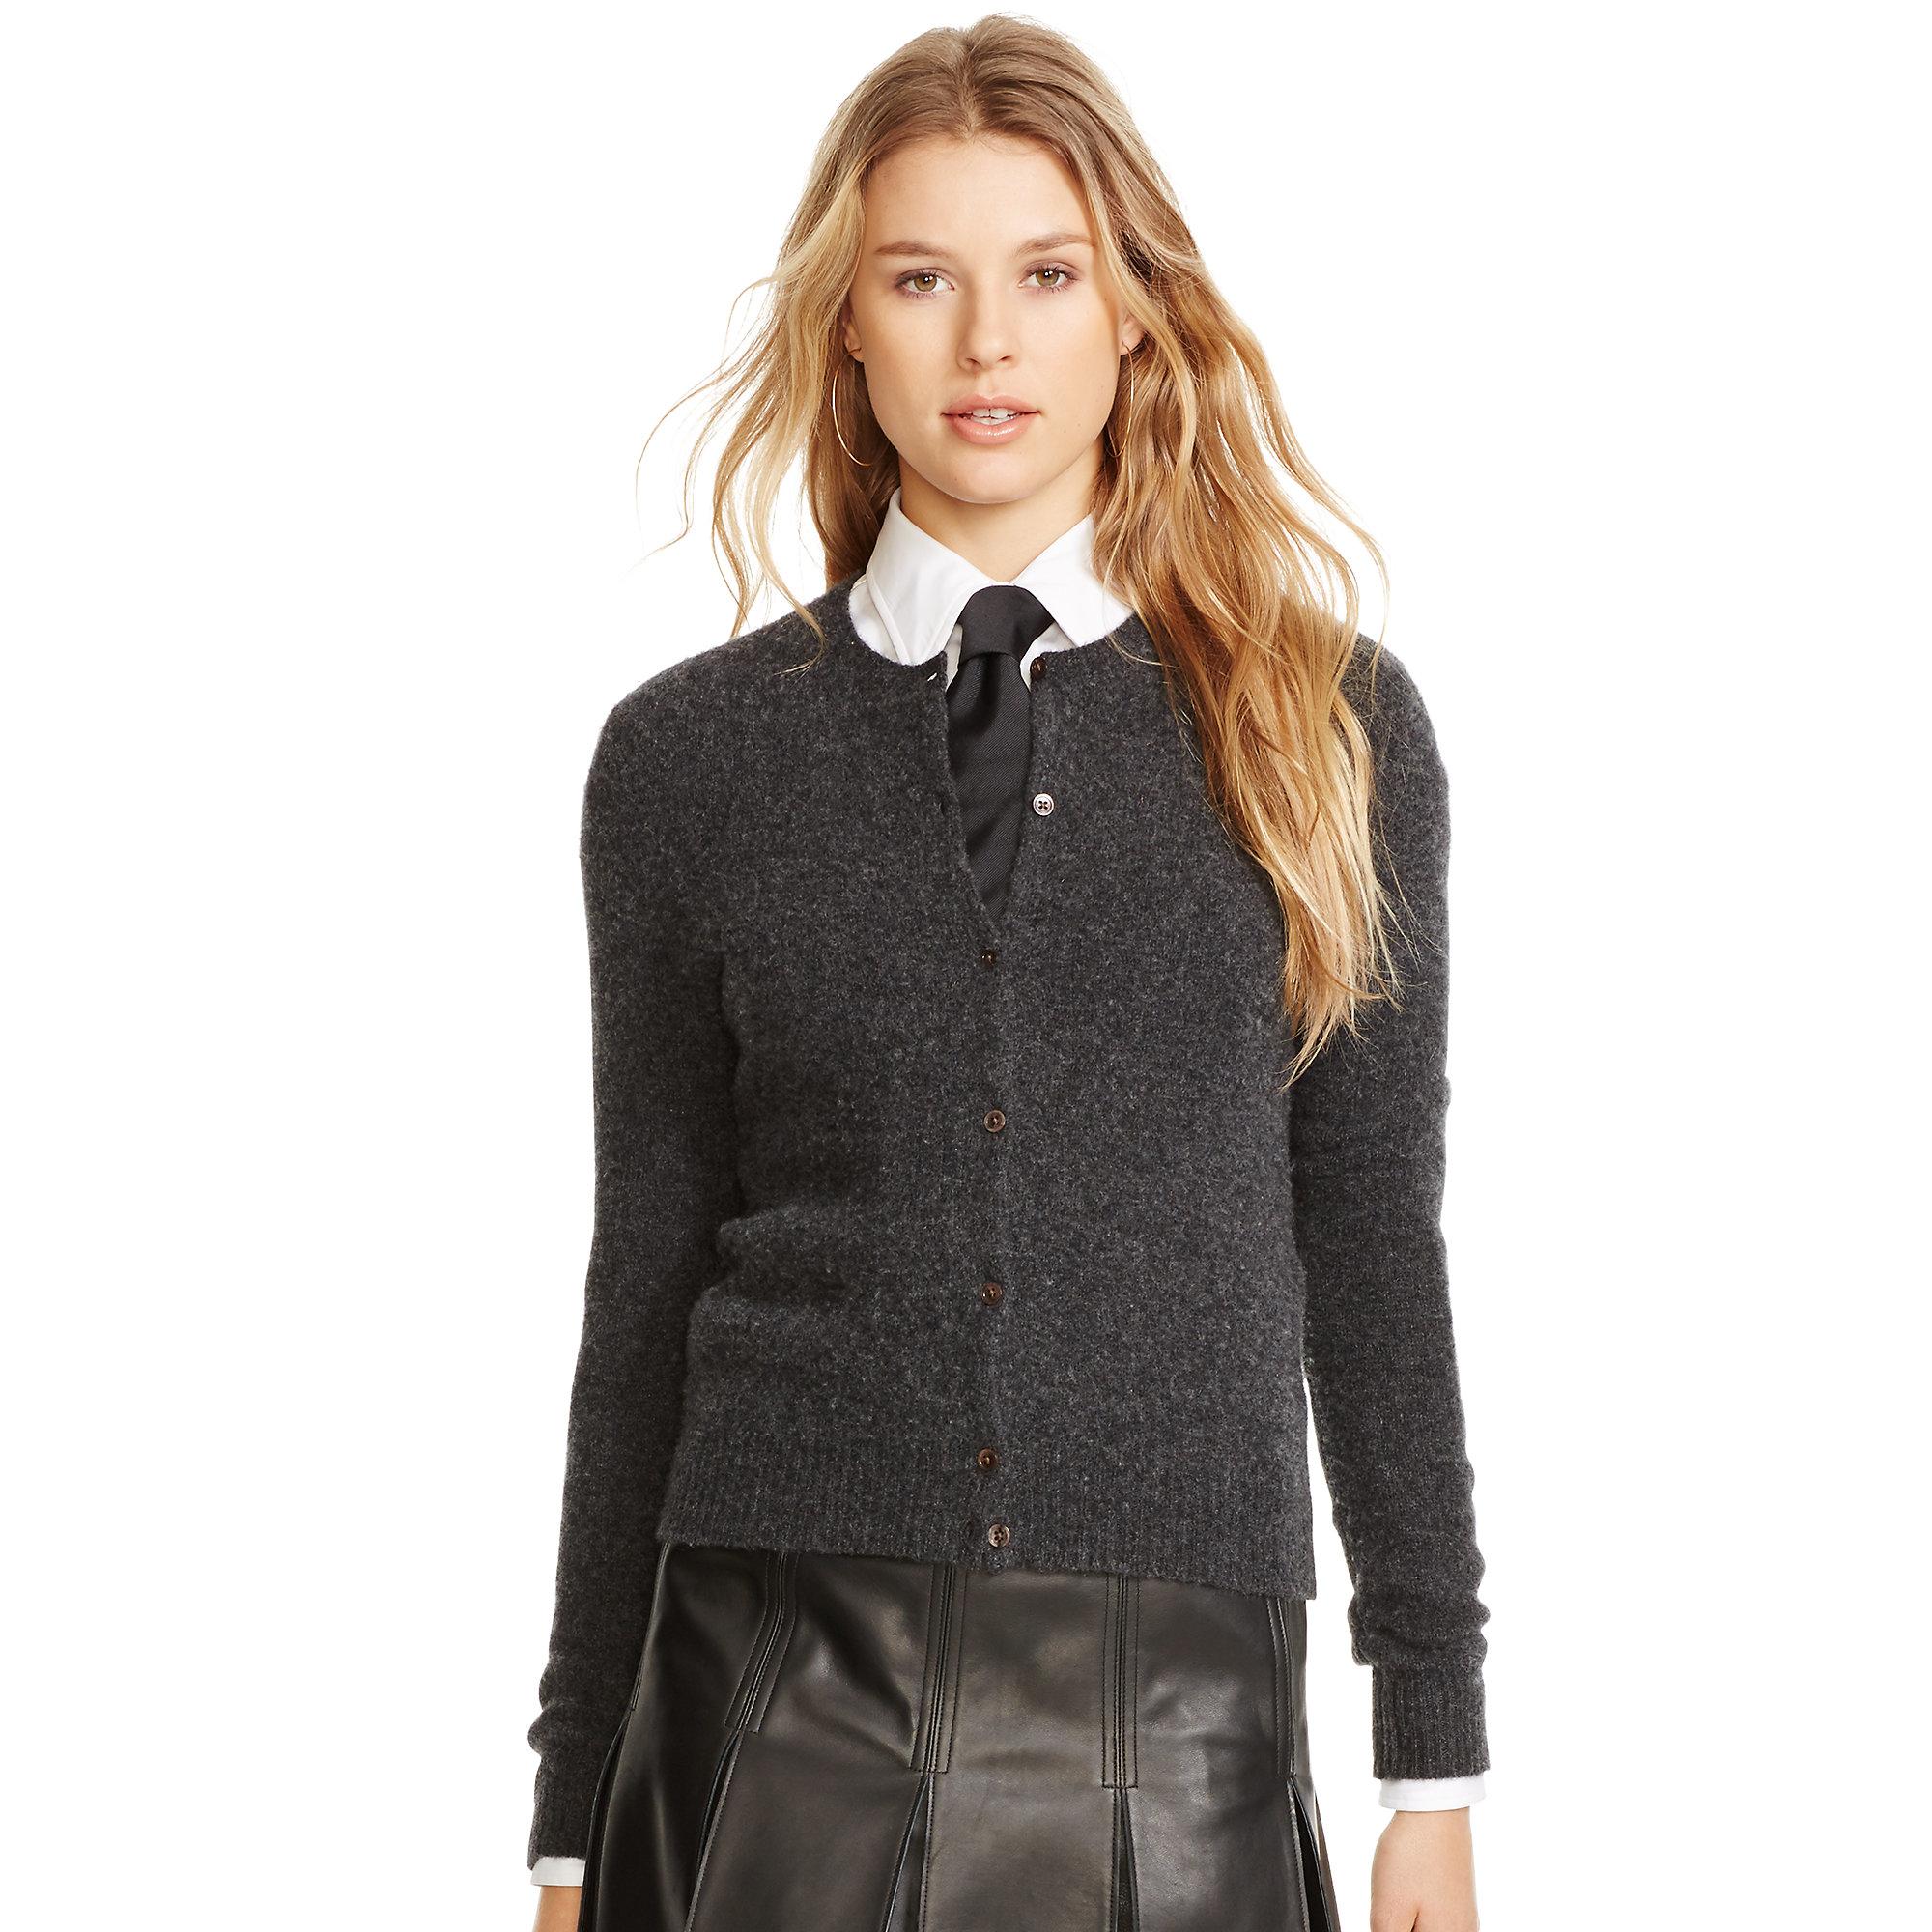 636c0c1f031b8 Lyst - Polo Ralph Lauren Wool-cashmere Cardigan in Gray